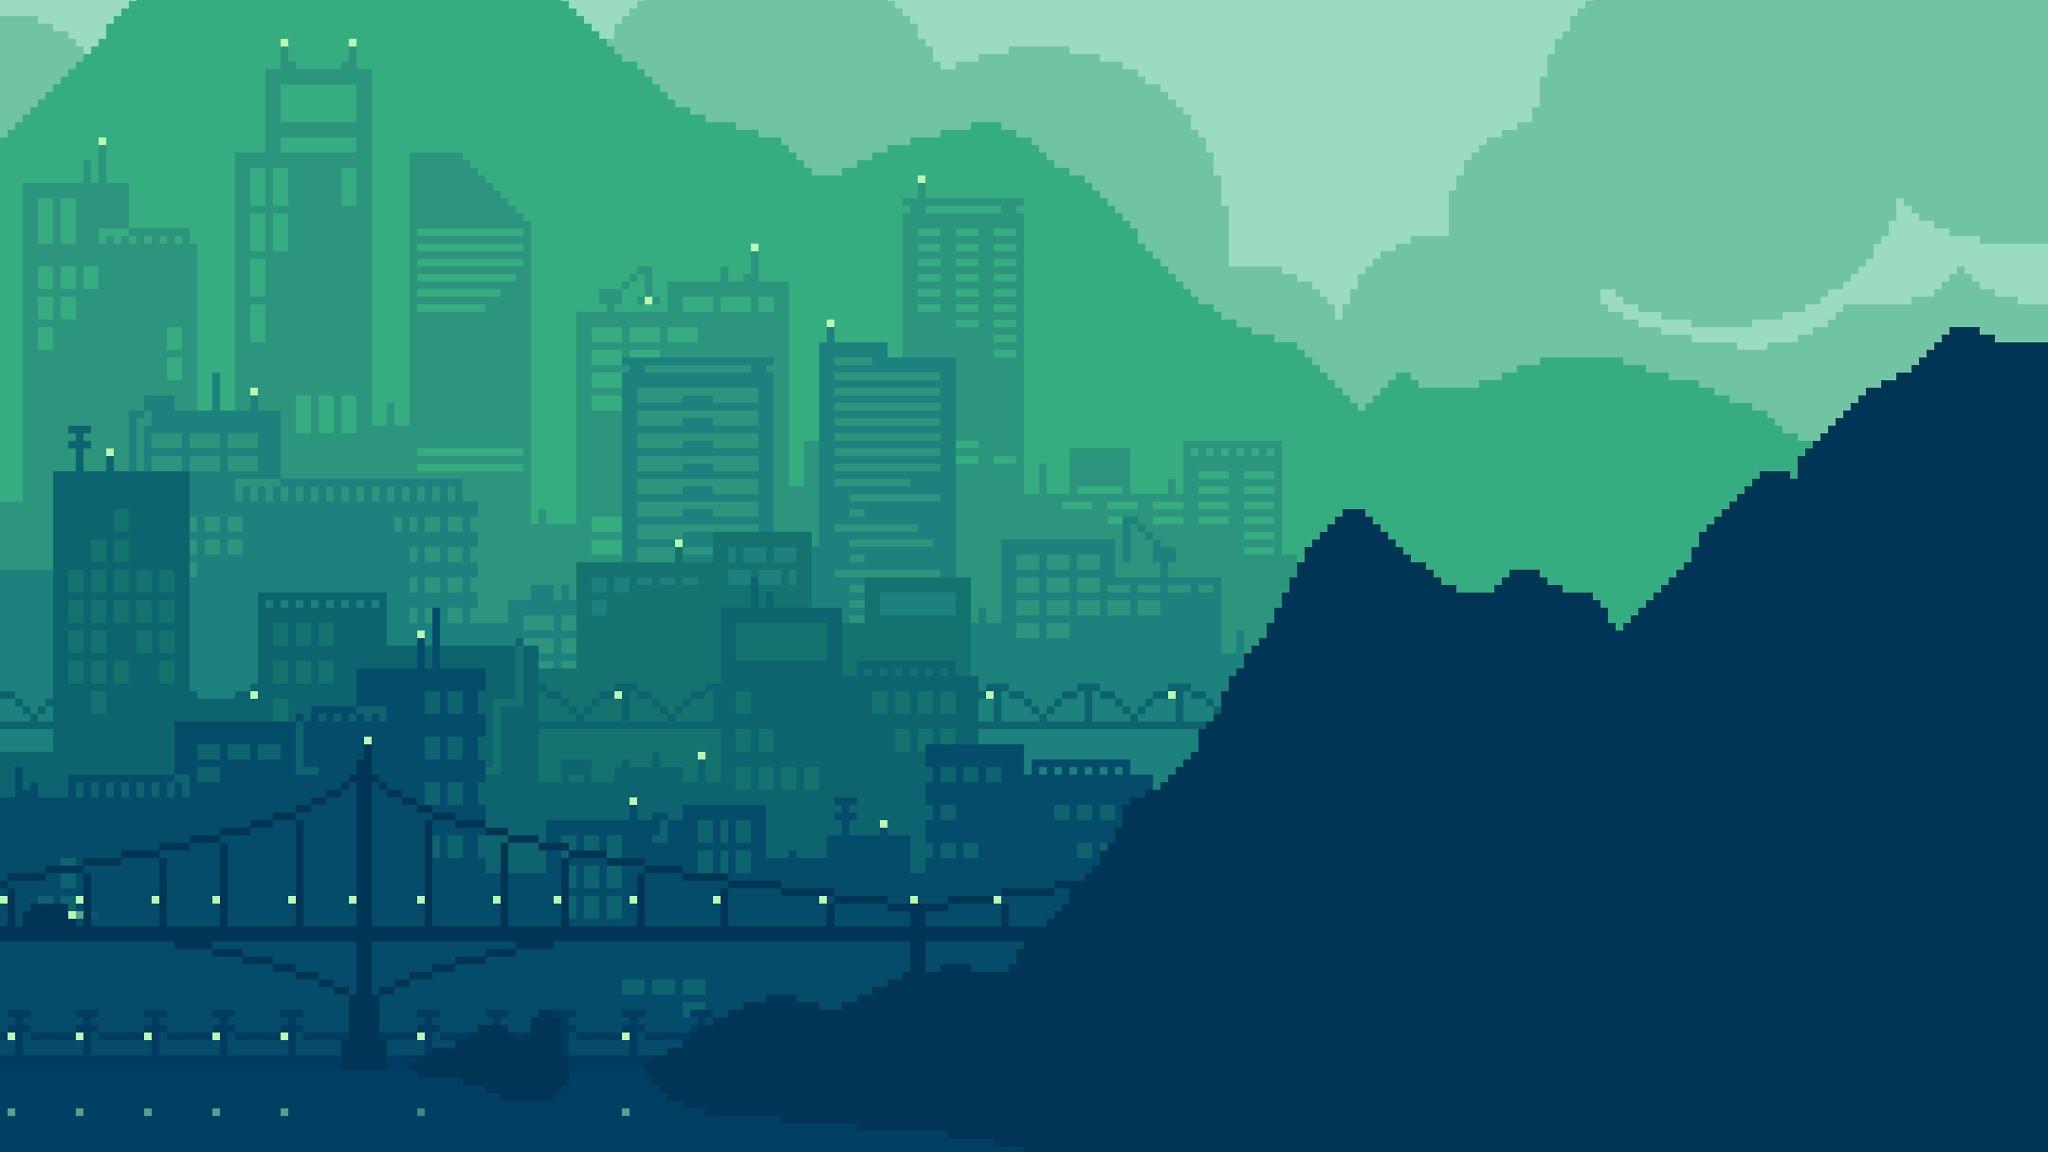 Beautiful Tumblr Backgrounds Captaincicerosco